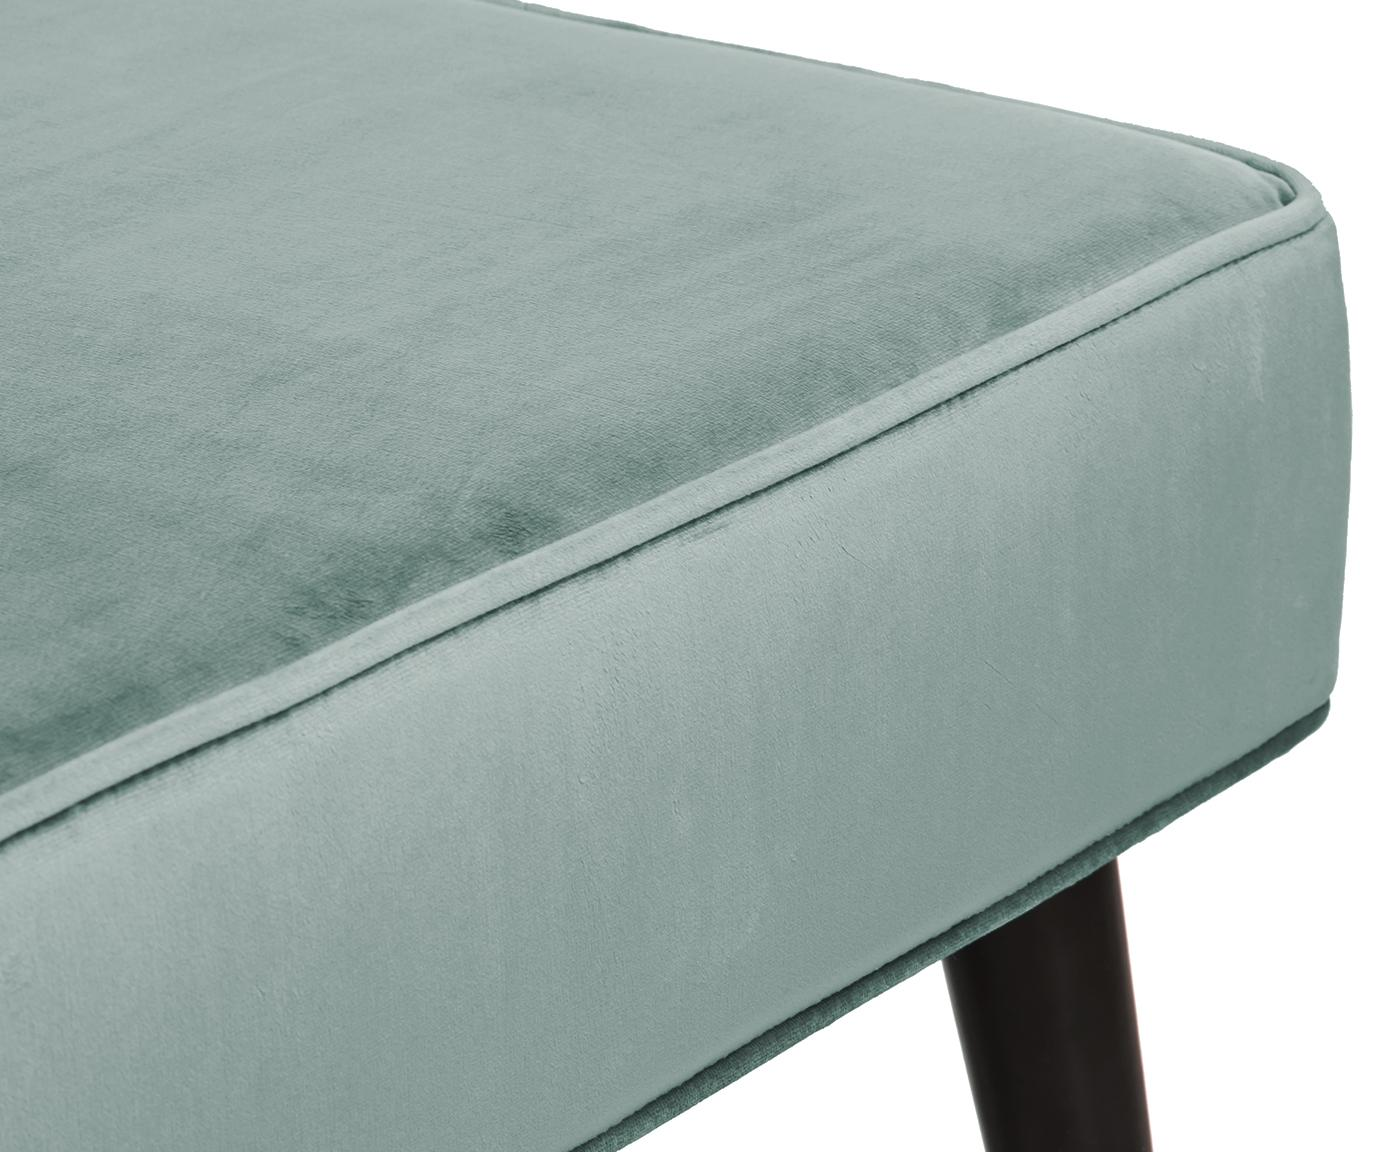 Fluwelen bank Beverly, Bekleding: fluweel (polyester), Frame: eucalyptushout, Poten: gepoedercoat metaal, Turquoise, 110 x 46 cm